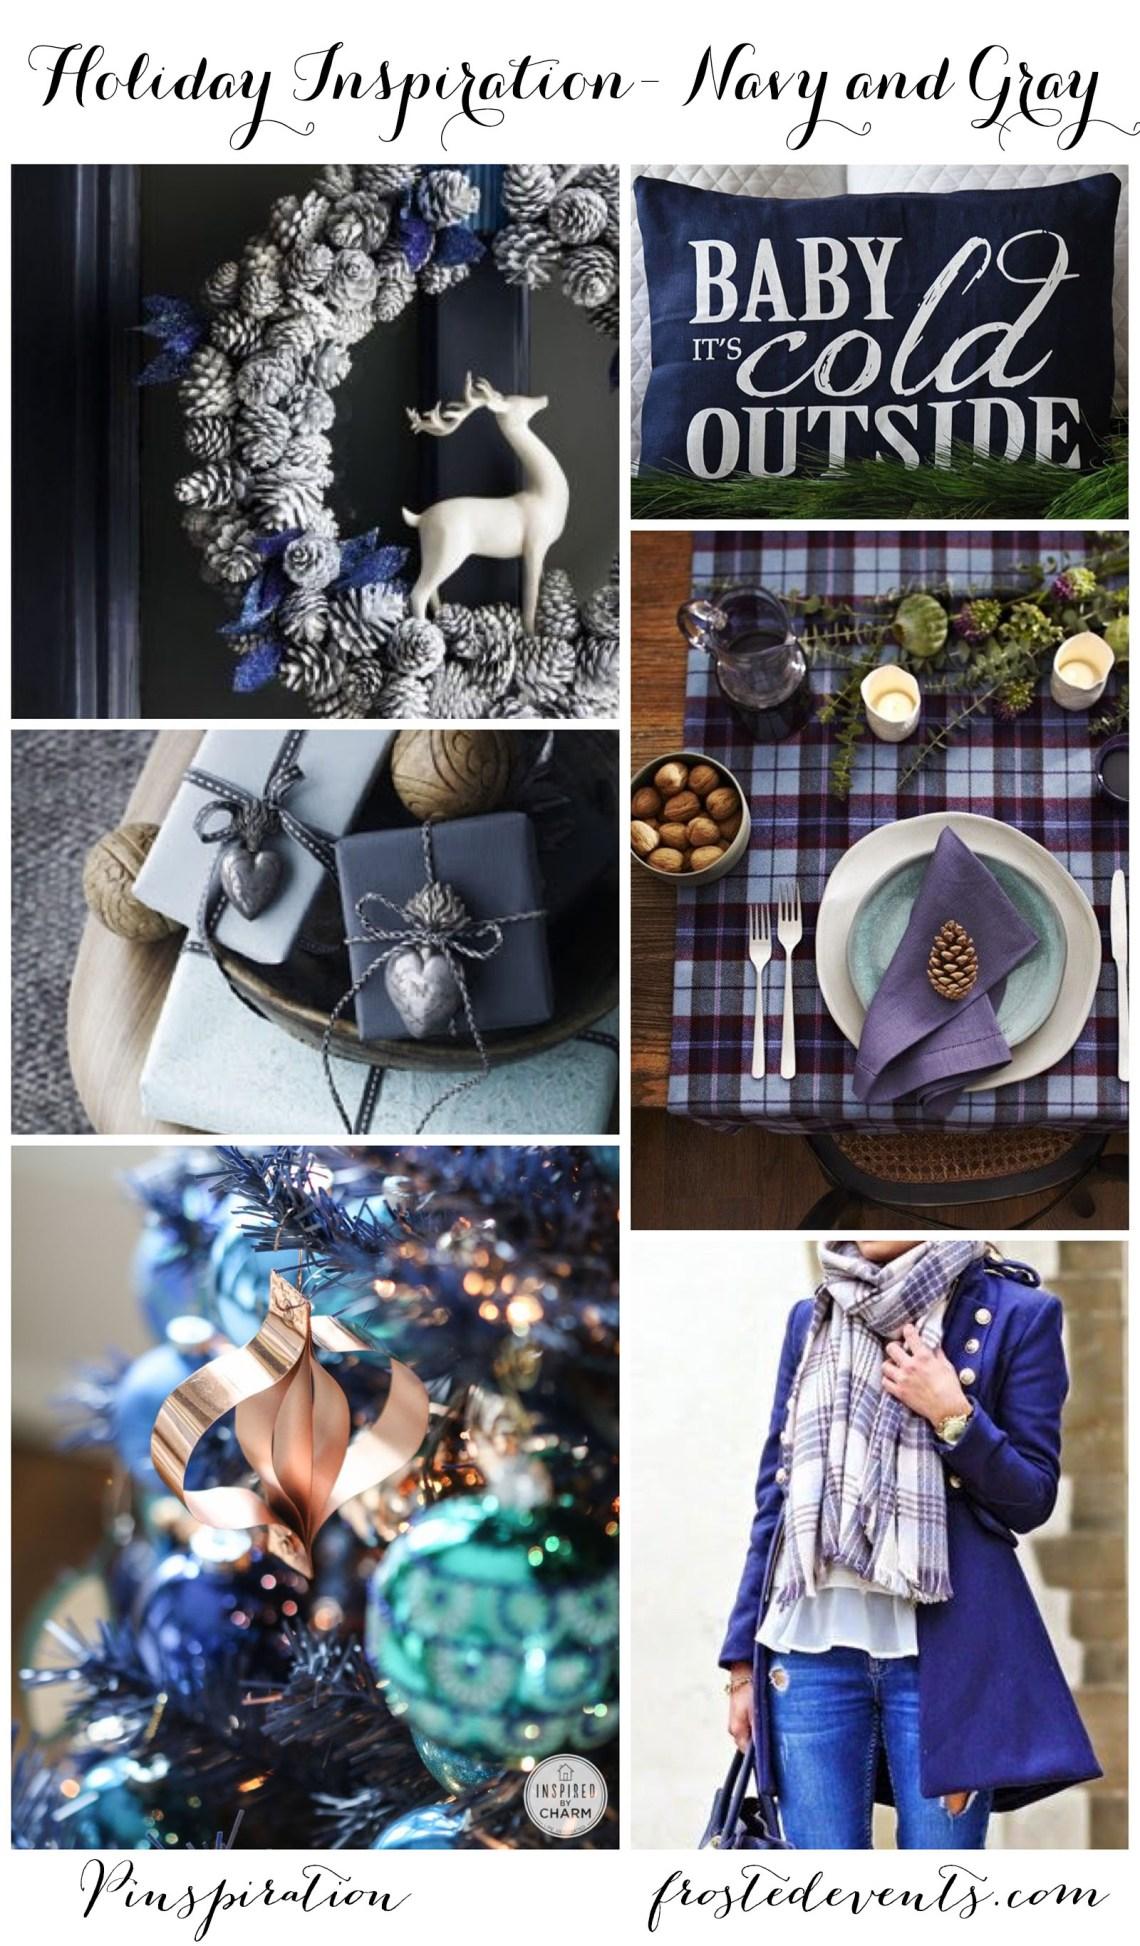 Christmas Decor Ideas + Blue and Gray Christmas + Blue Holiday Inspiration